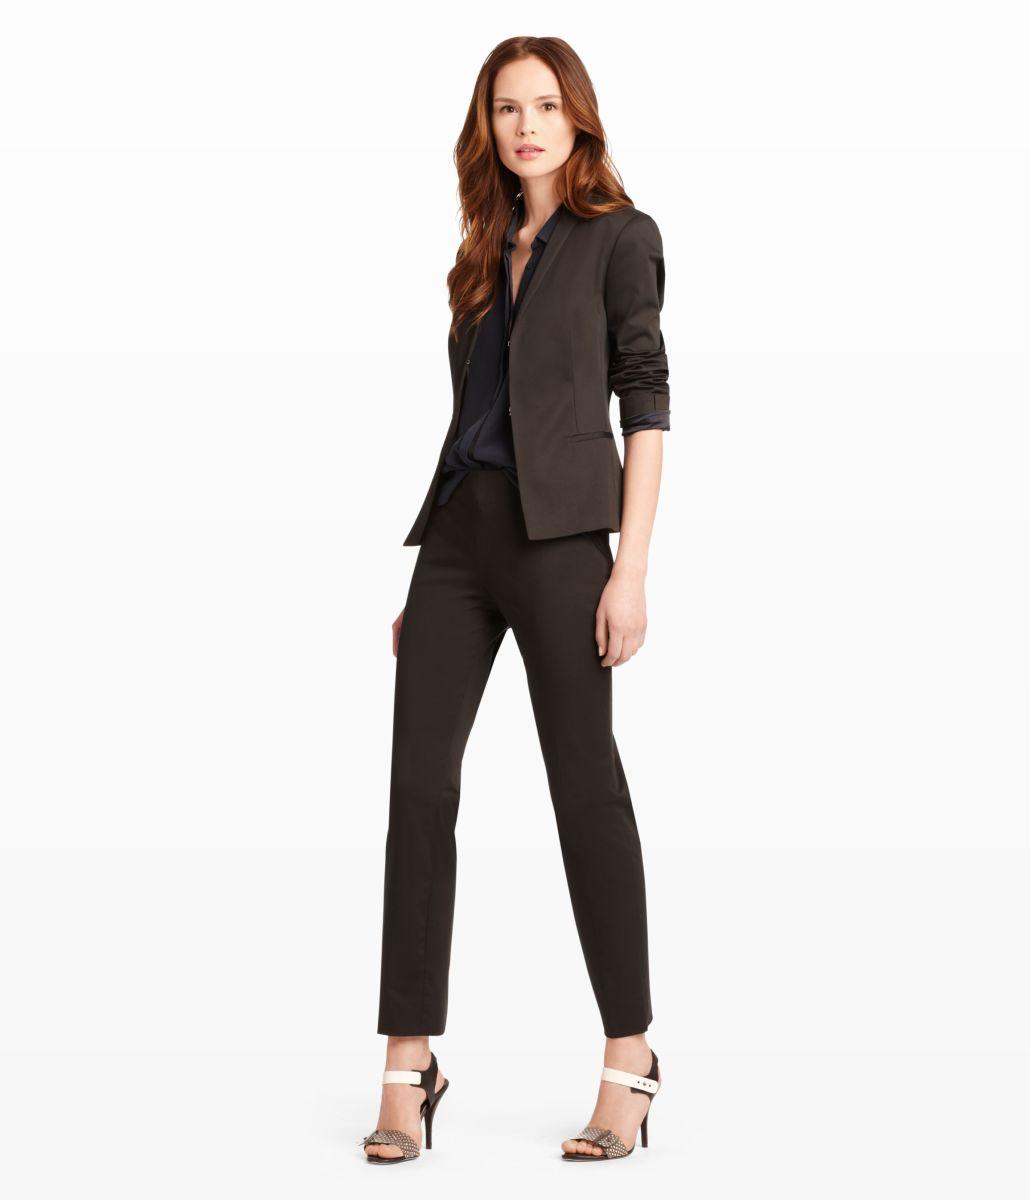 Black Three-piece Pant Suit